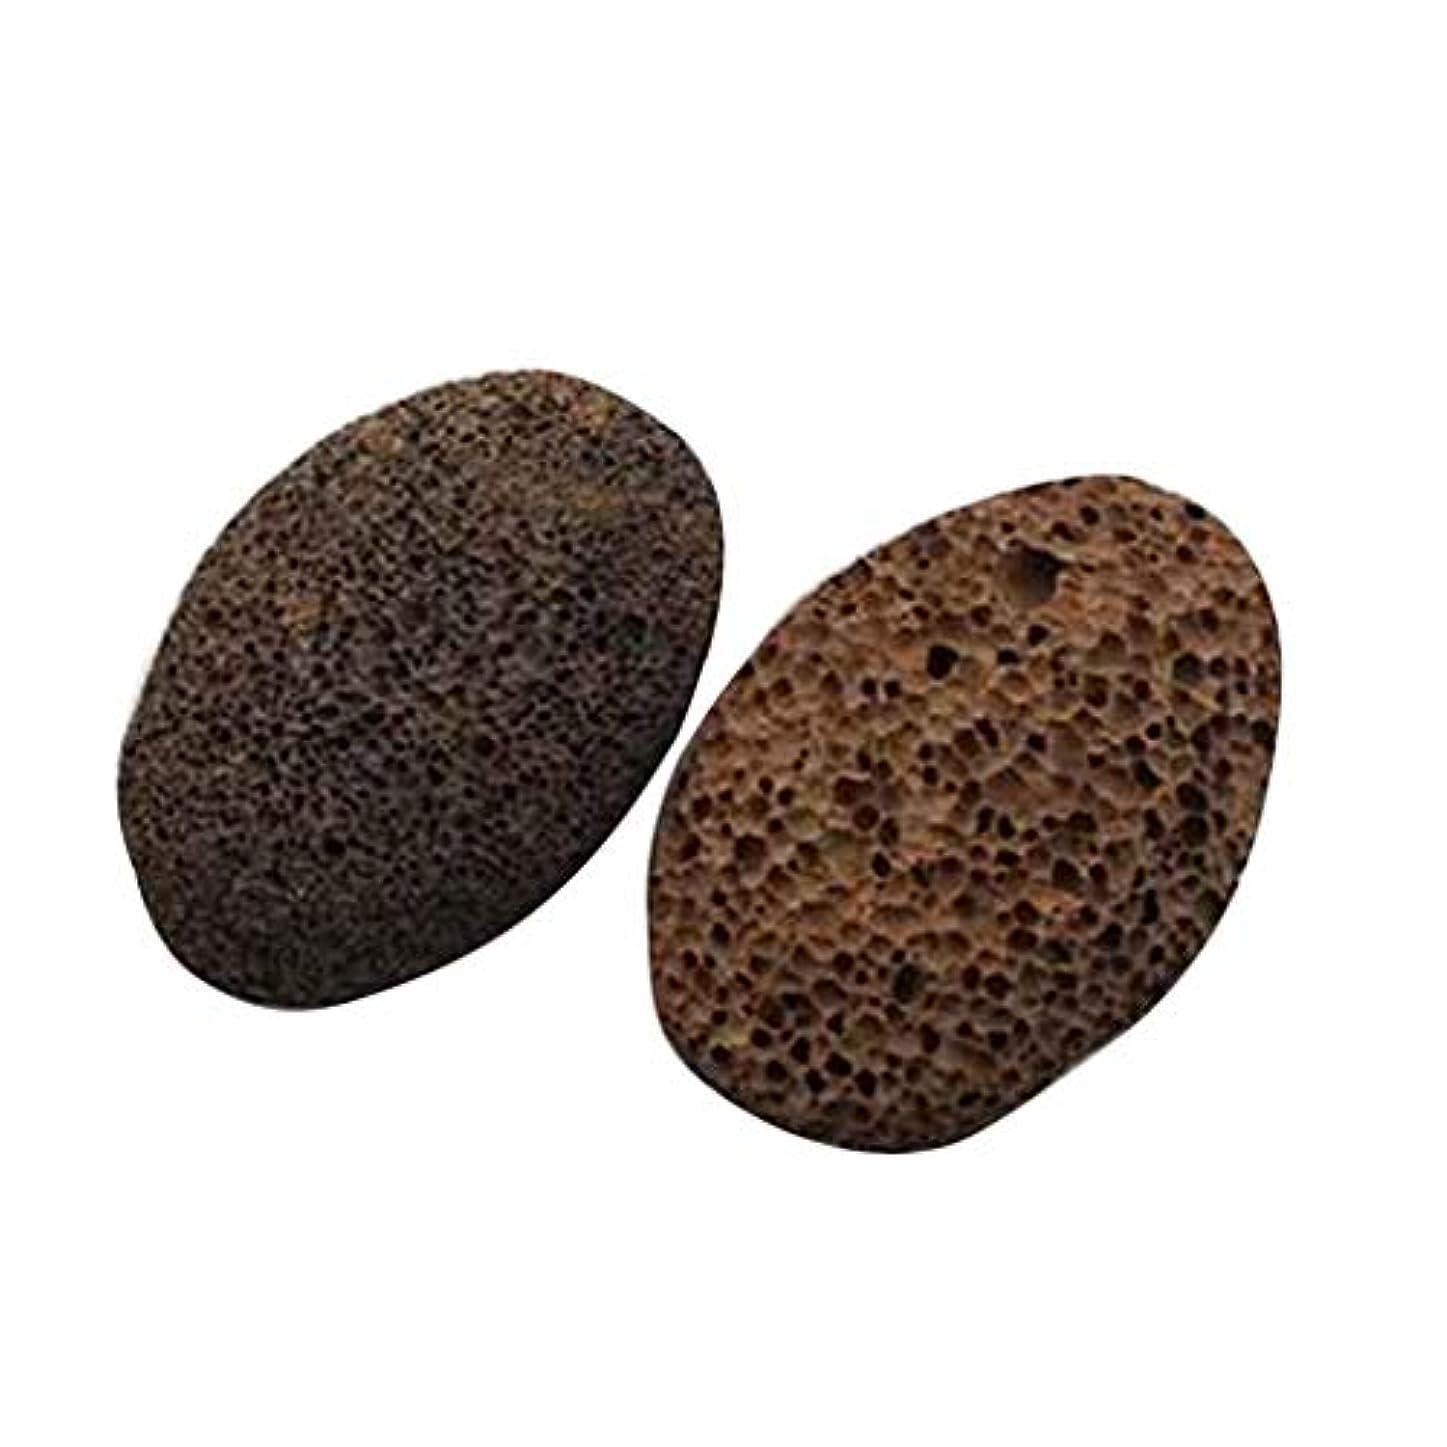 Nerhaily 死んだ皮軽石を取り除き 足石を挽いて 自然の火山石を剥がします 足マッサージ石 ワイプ足石 2個セット